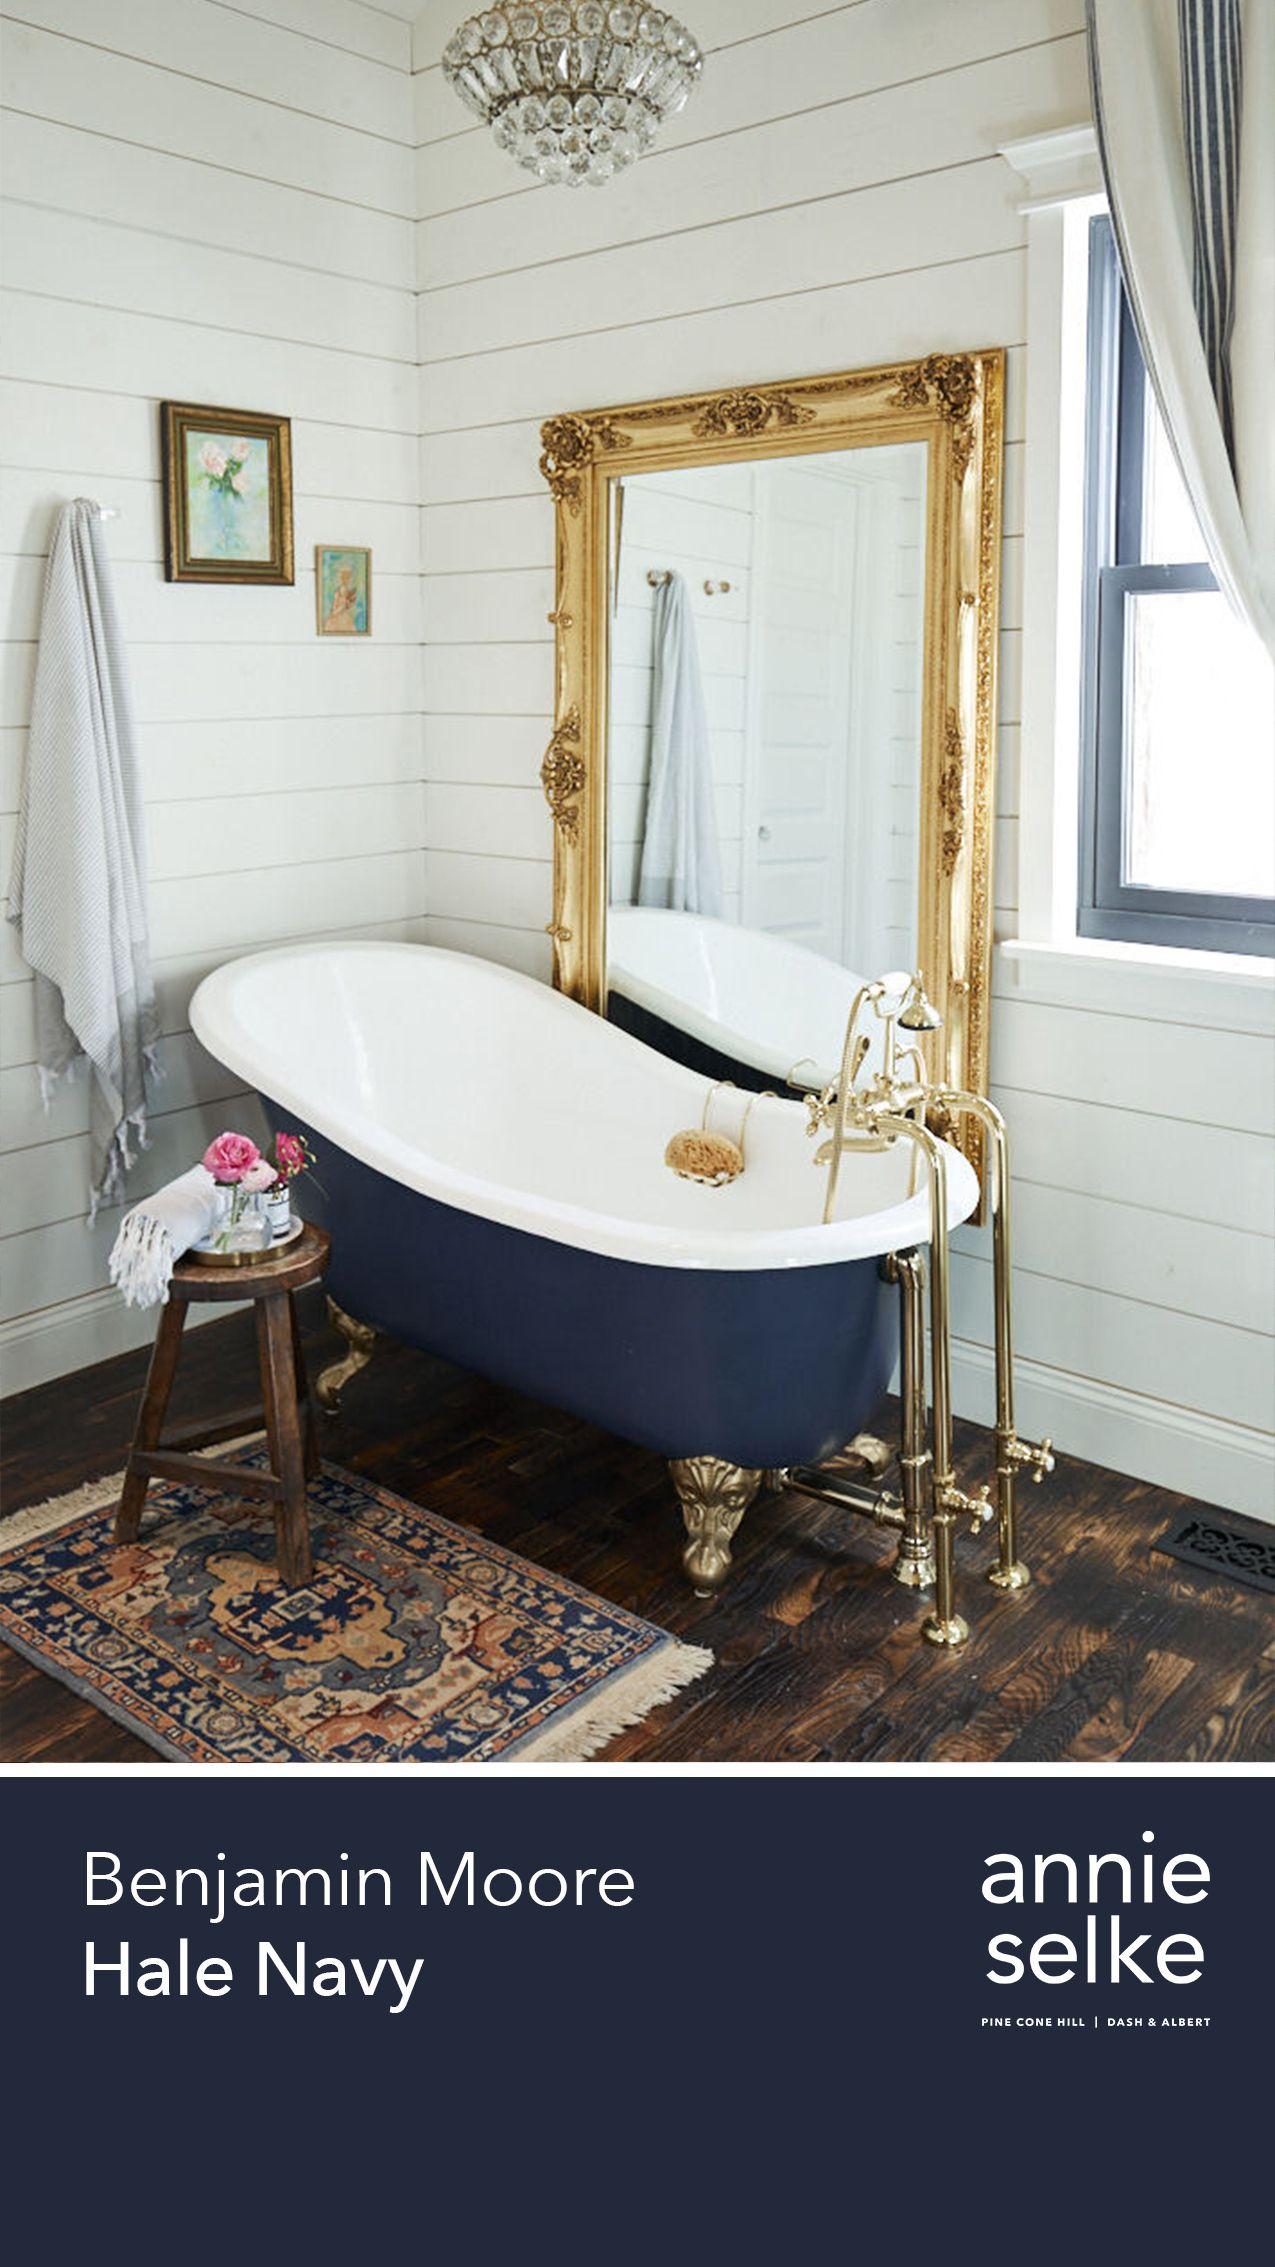 Craigslist Clawfoot Tub : craigslist, clawfoot, Inviting, Paint, Colors, Fresh, American, Style, Annie, Selke, Black, Clawfoot, Colors,, Bathroom, Decorating